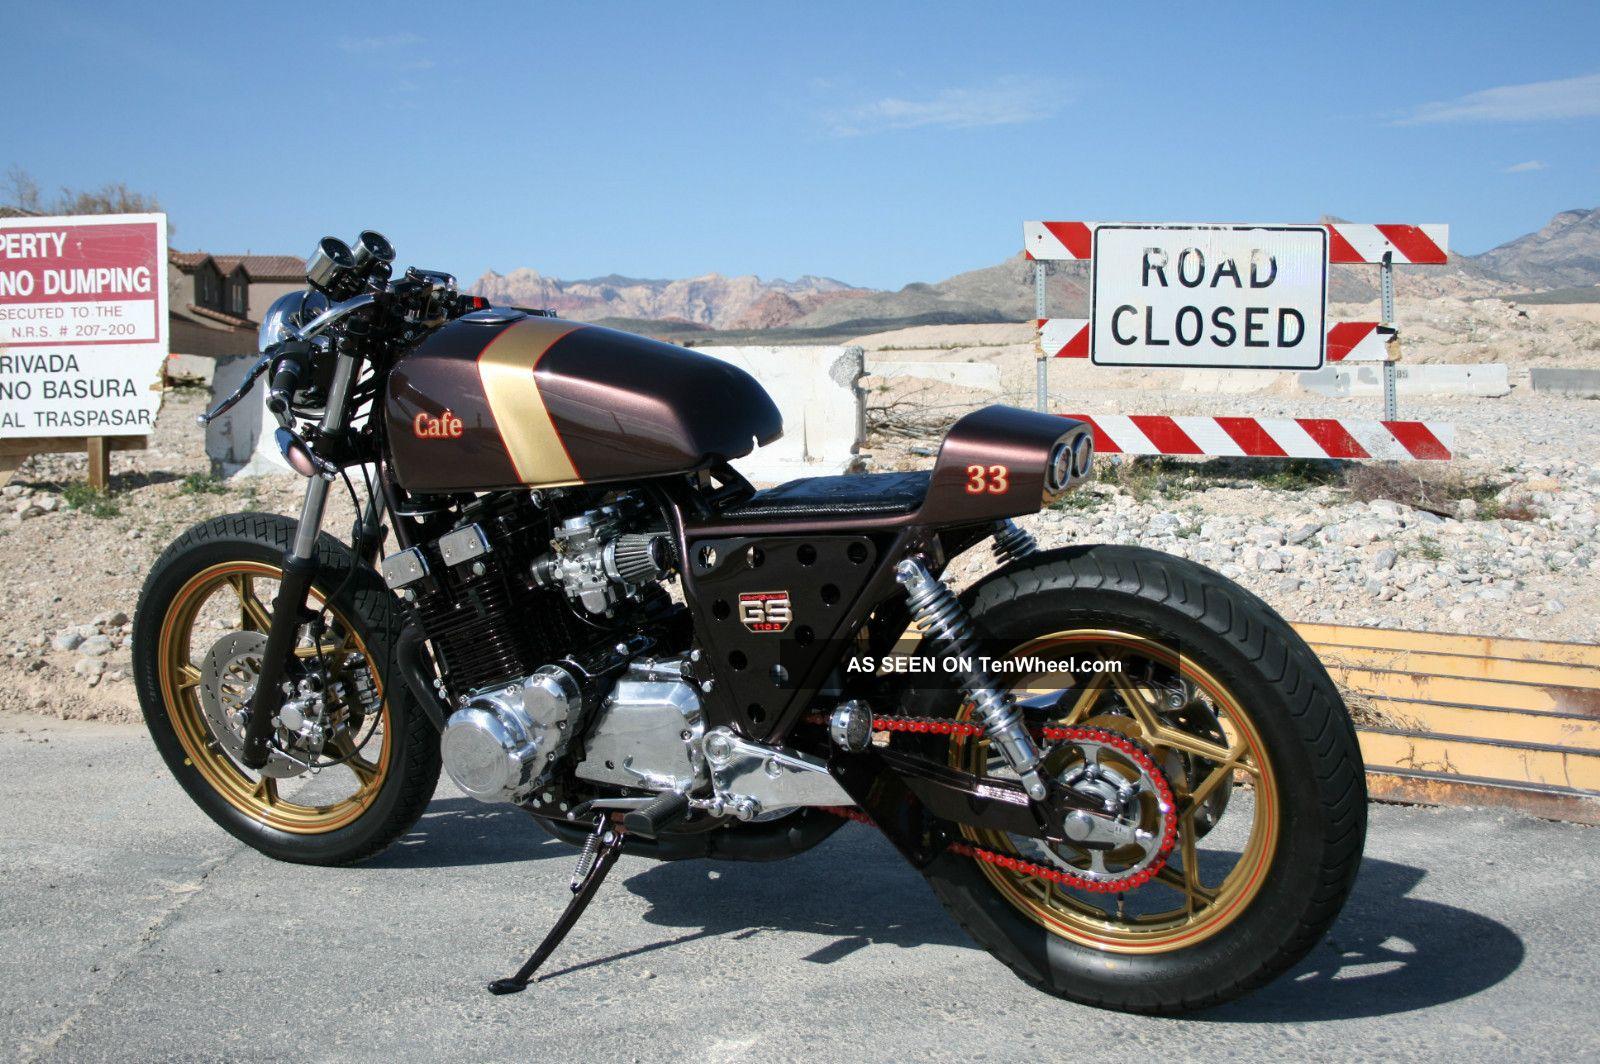 Custom Cafe Racer Motorcycle - 1981 Suzuki Gs1100e -